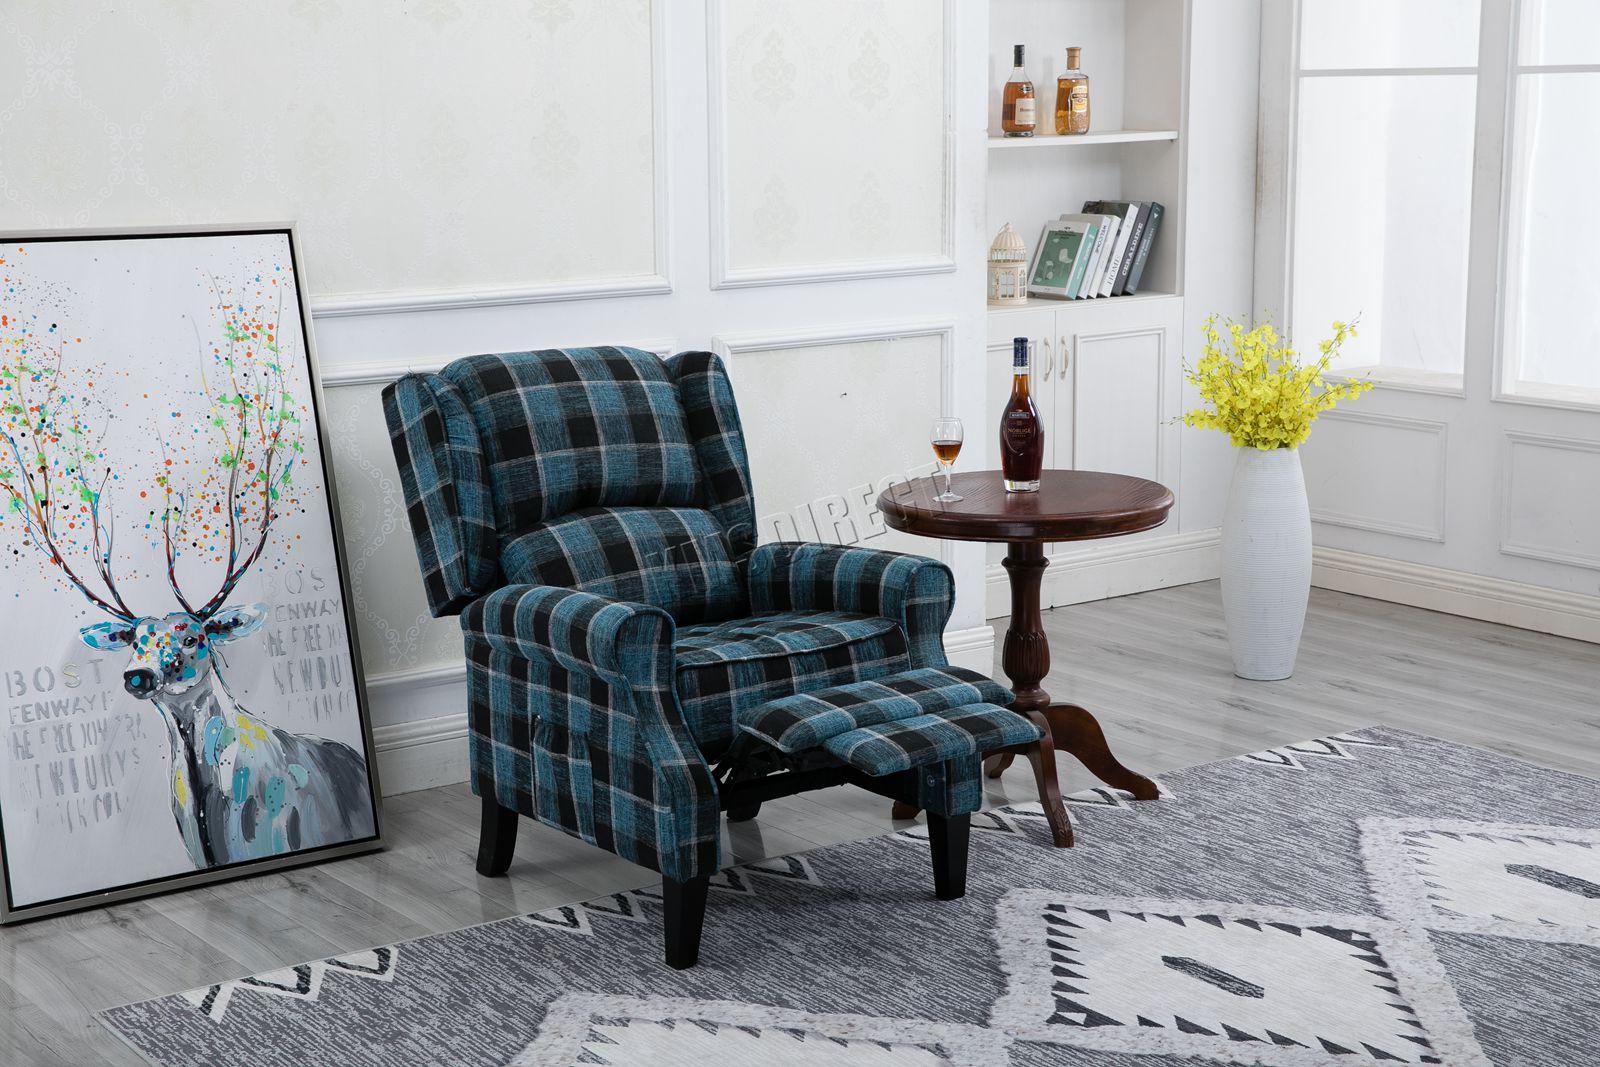 Vasca Da Bagno Divano.Westwood Vintage Armchair Sofa Recliner Lounge Fabric Tub Chair Seat